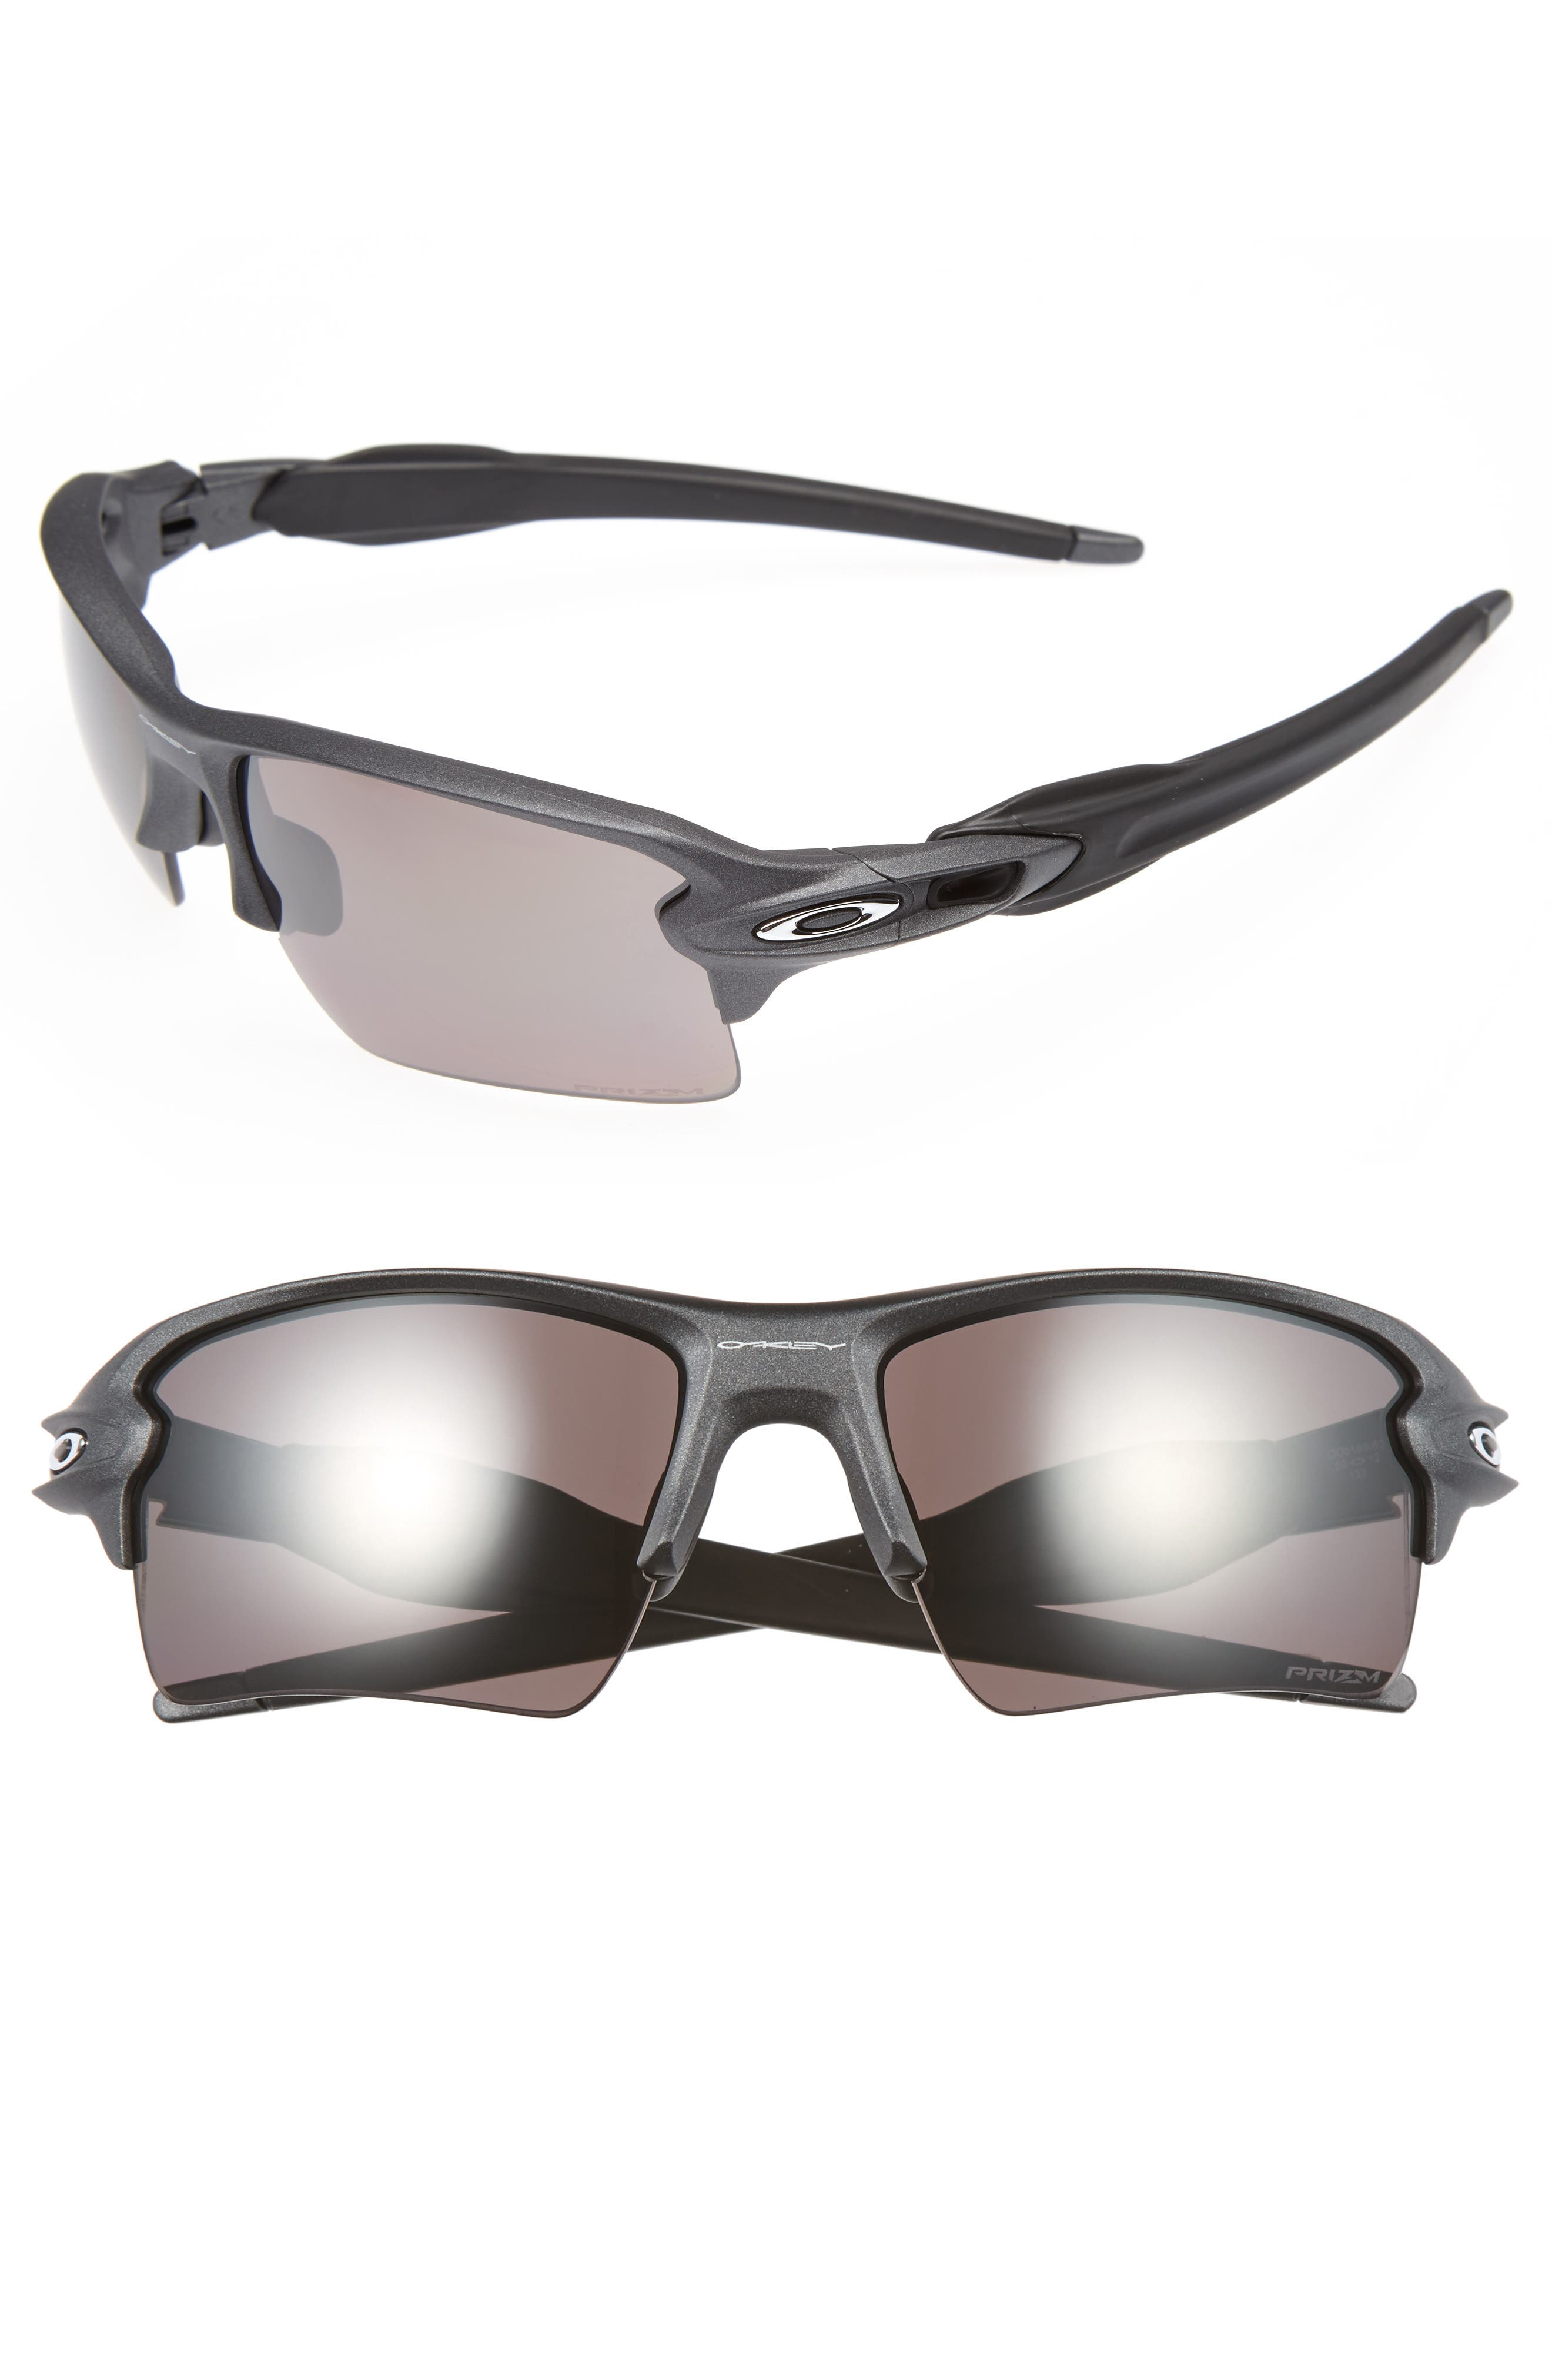 Flak 2.0 XL 59mm Polarized Sunglasses,                             Main thumbnail 1, color,                             020